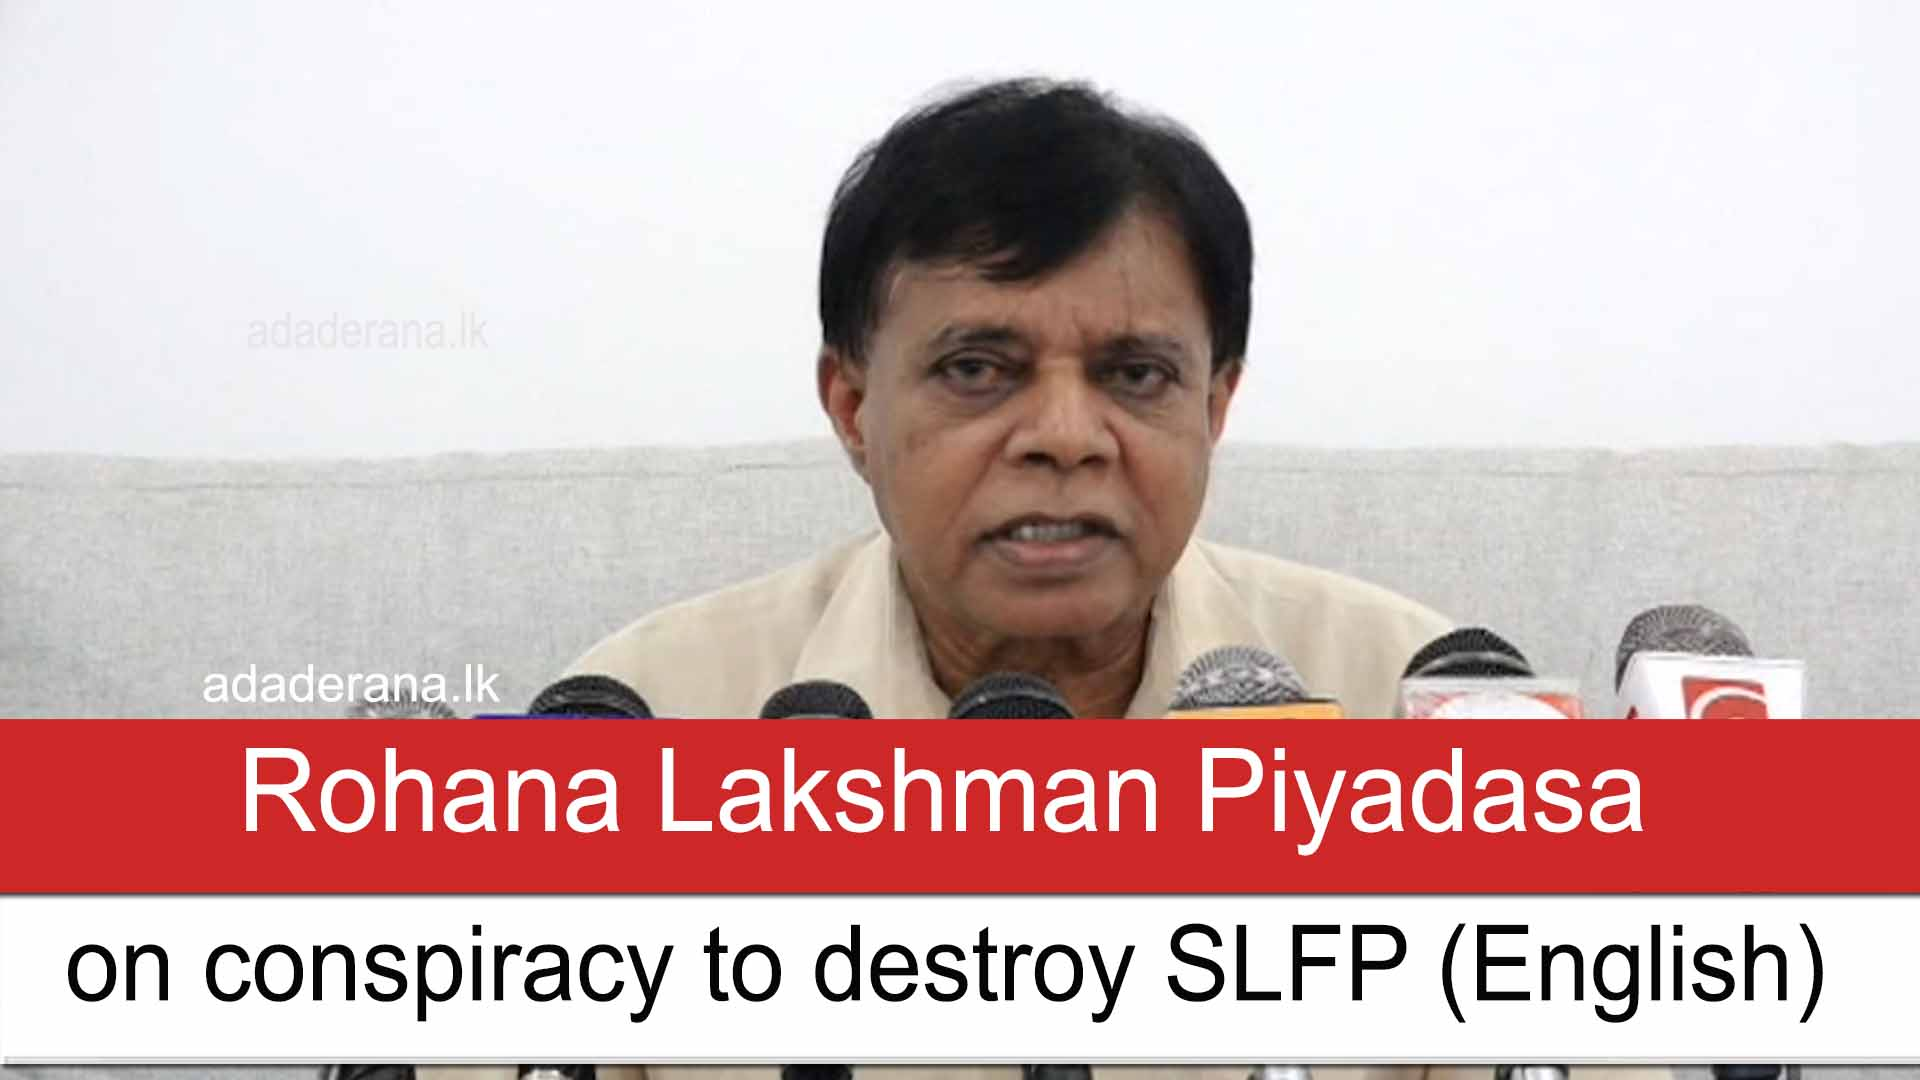 Rohana Lakshman Piyadasa on conspiracy to destroy SLFP (English)